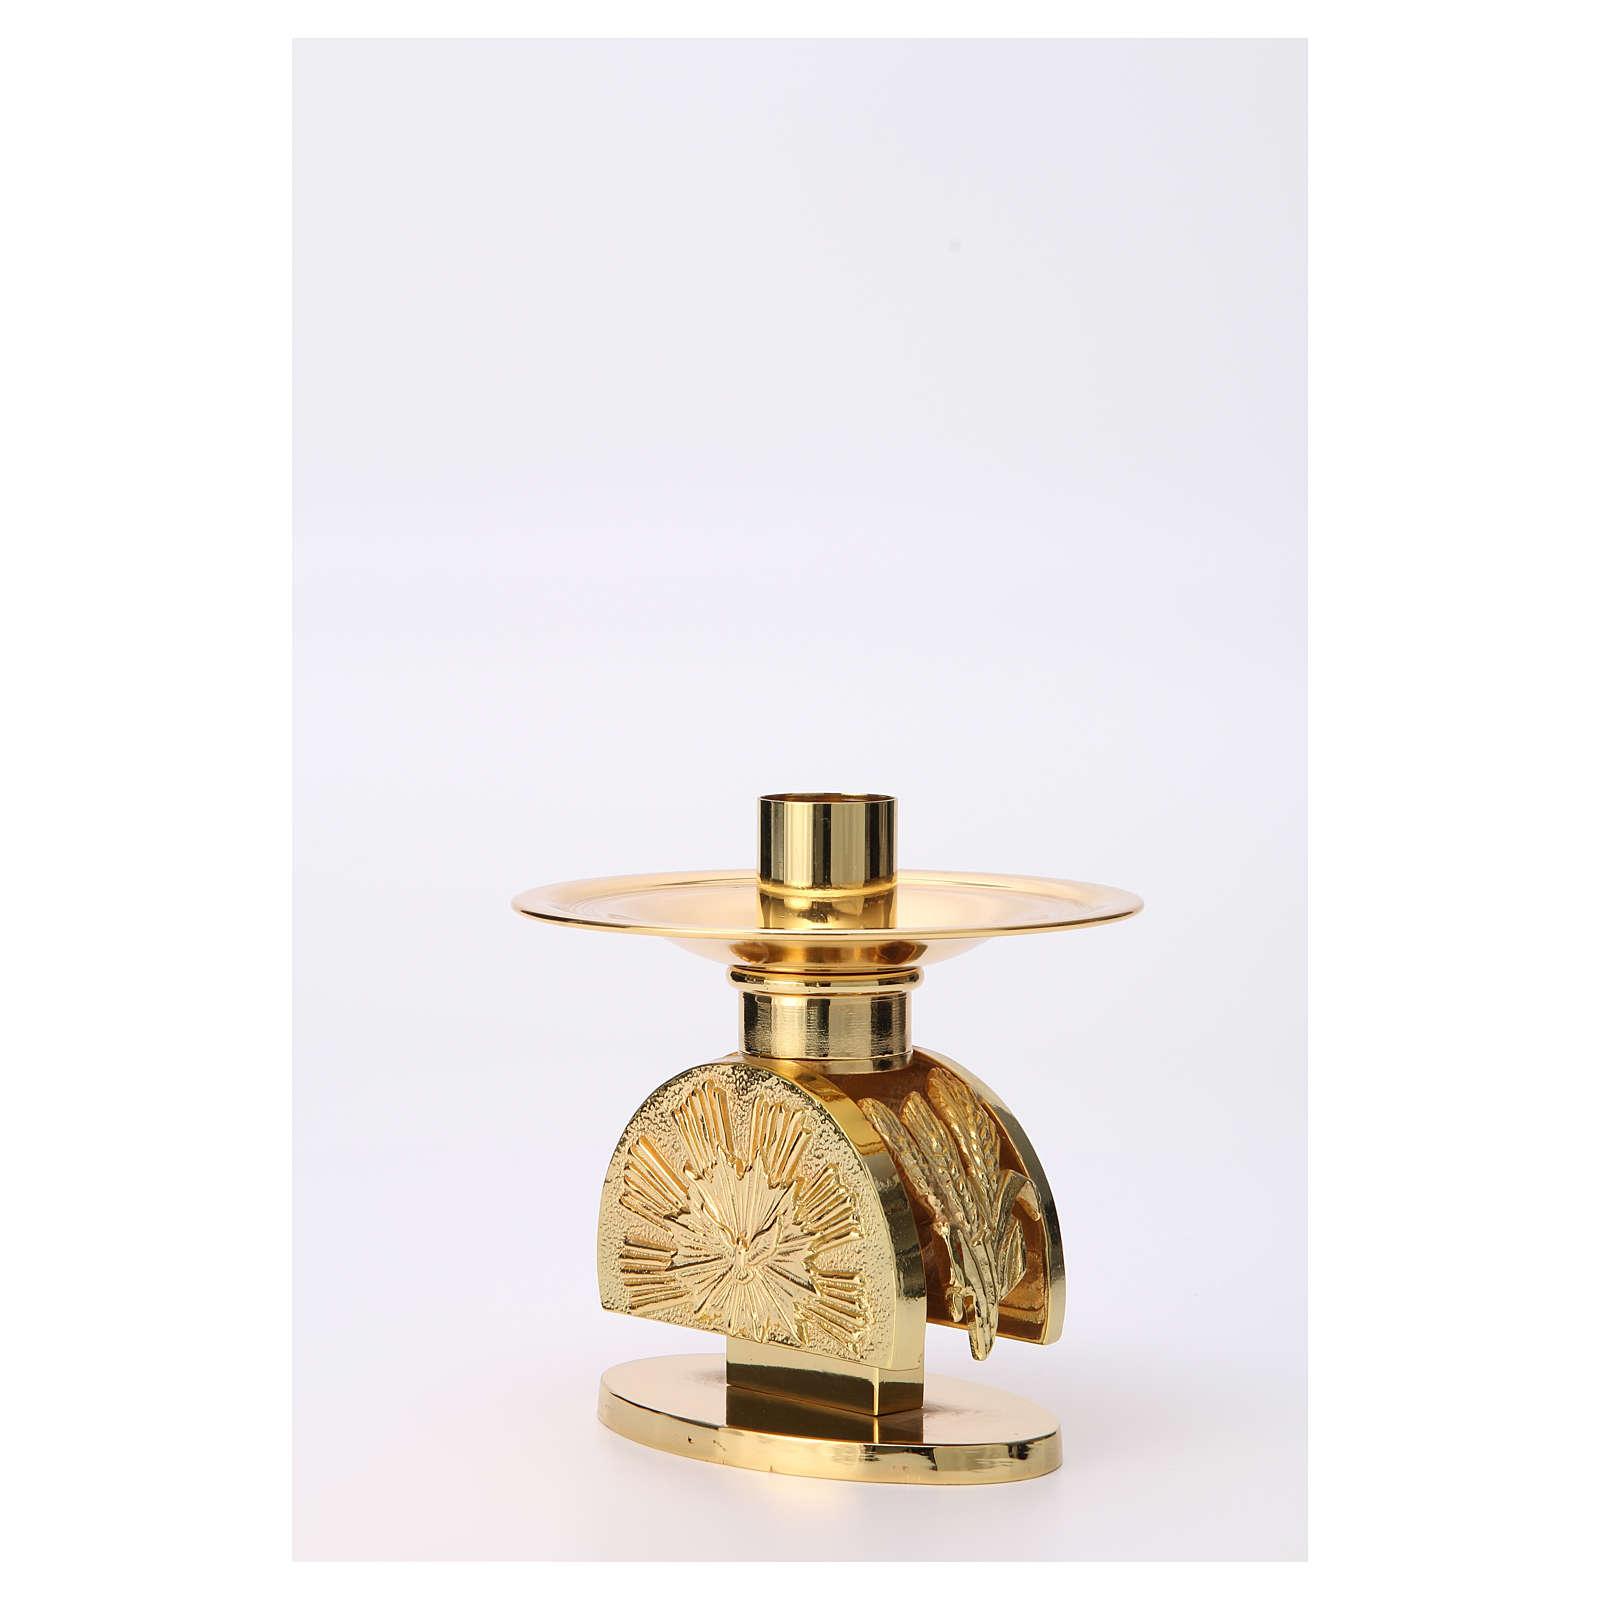 Altar candlestick in golden brass, semi circular shape 4